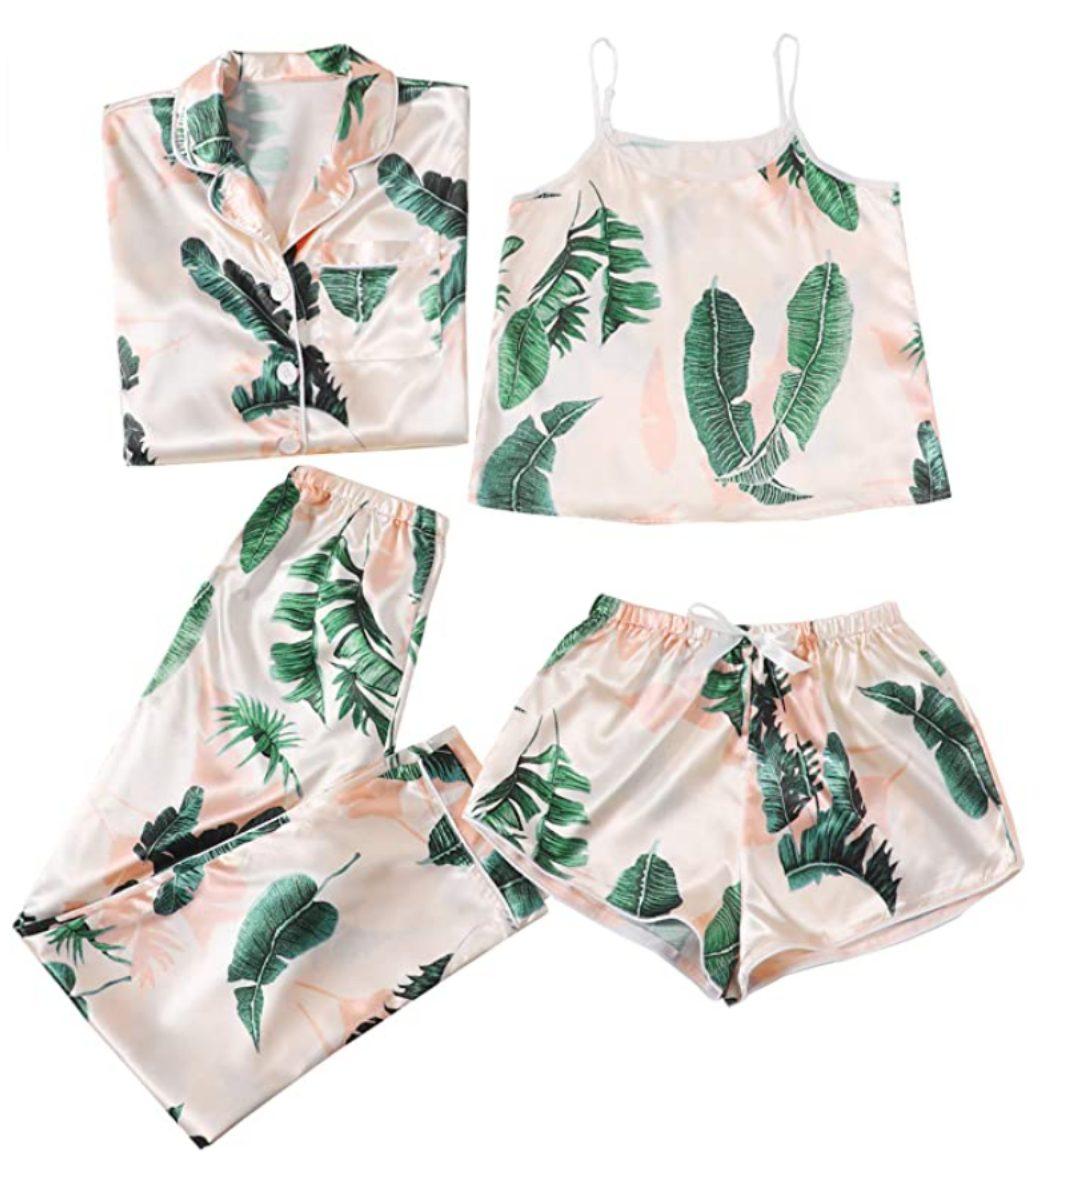 Women's Sleepwear 4pcs Satin Cami with Shirt Pajama Set